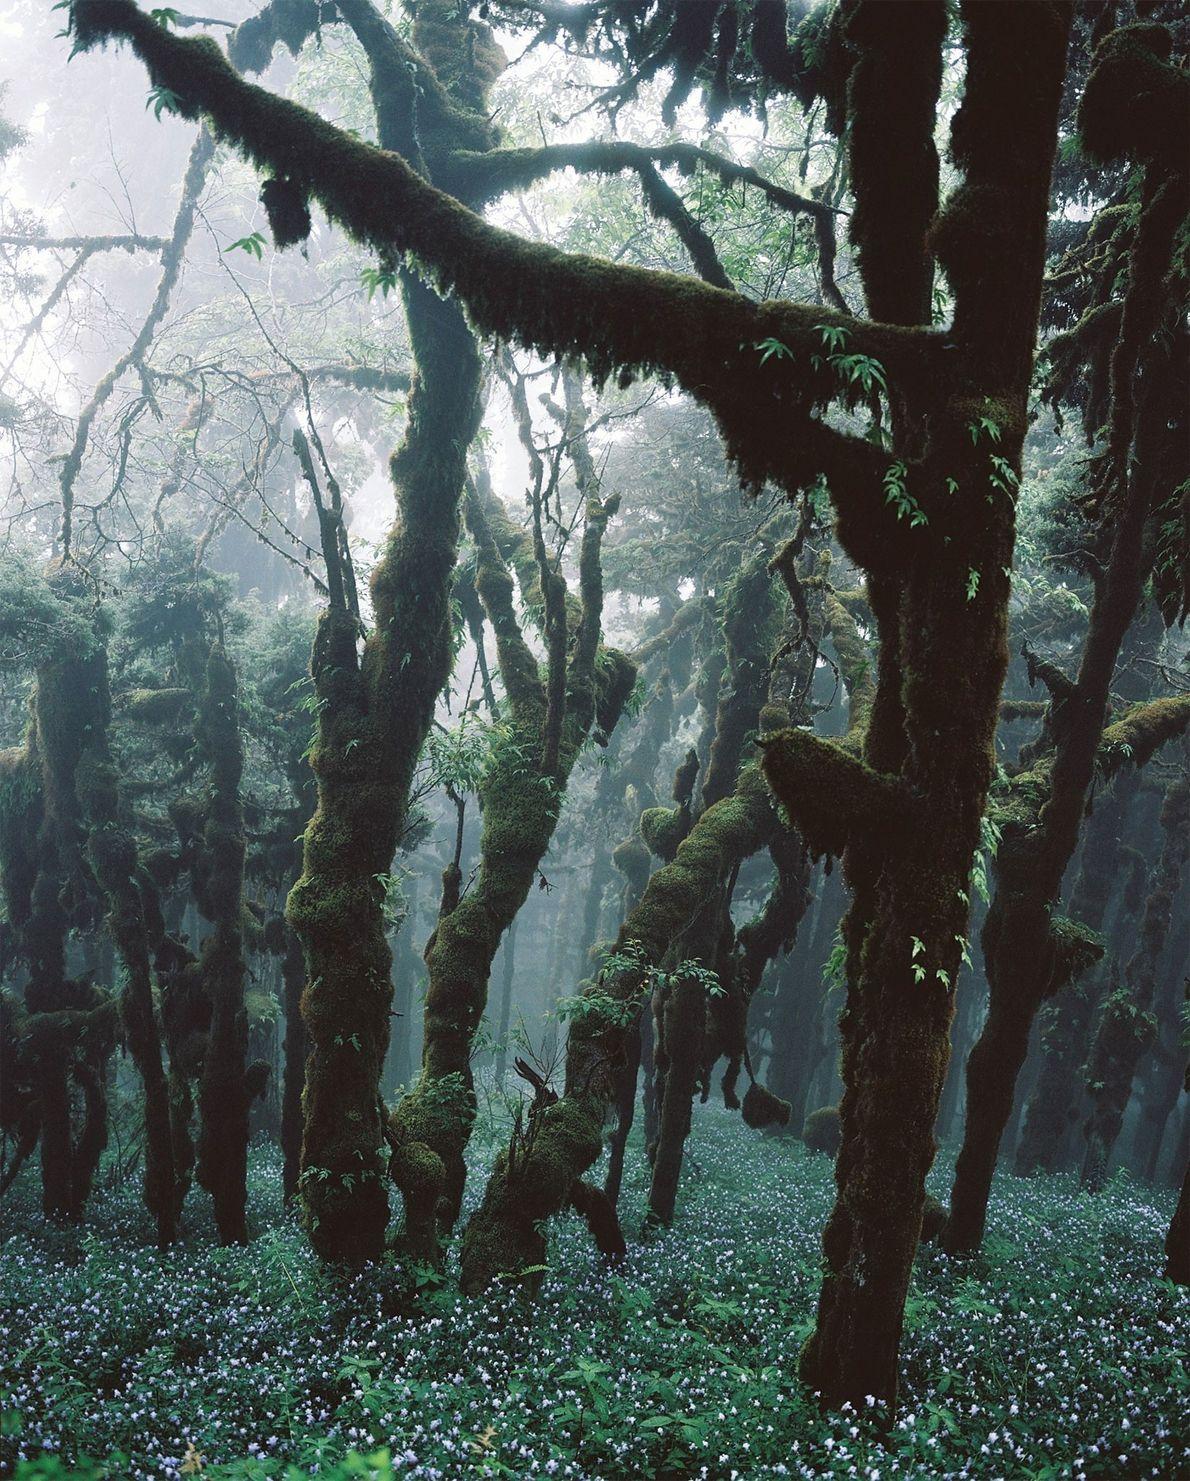 Fir trees create a dense cover in this Bhutan forest. Bhutan's constitution guarantees that 60 percent ...